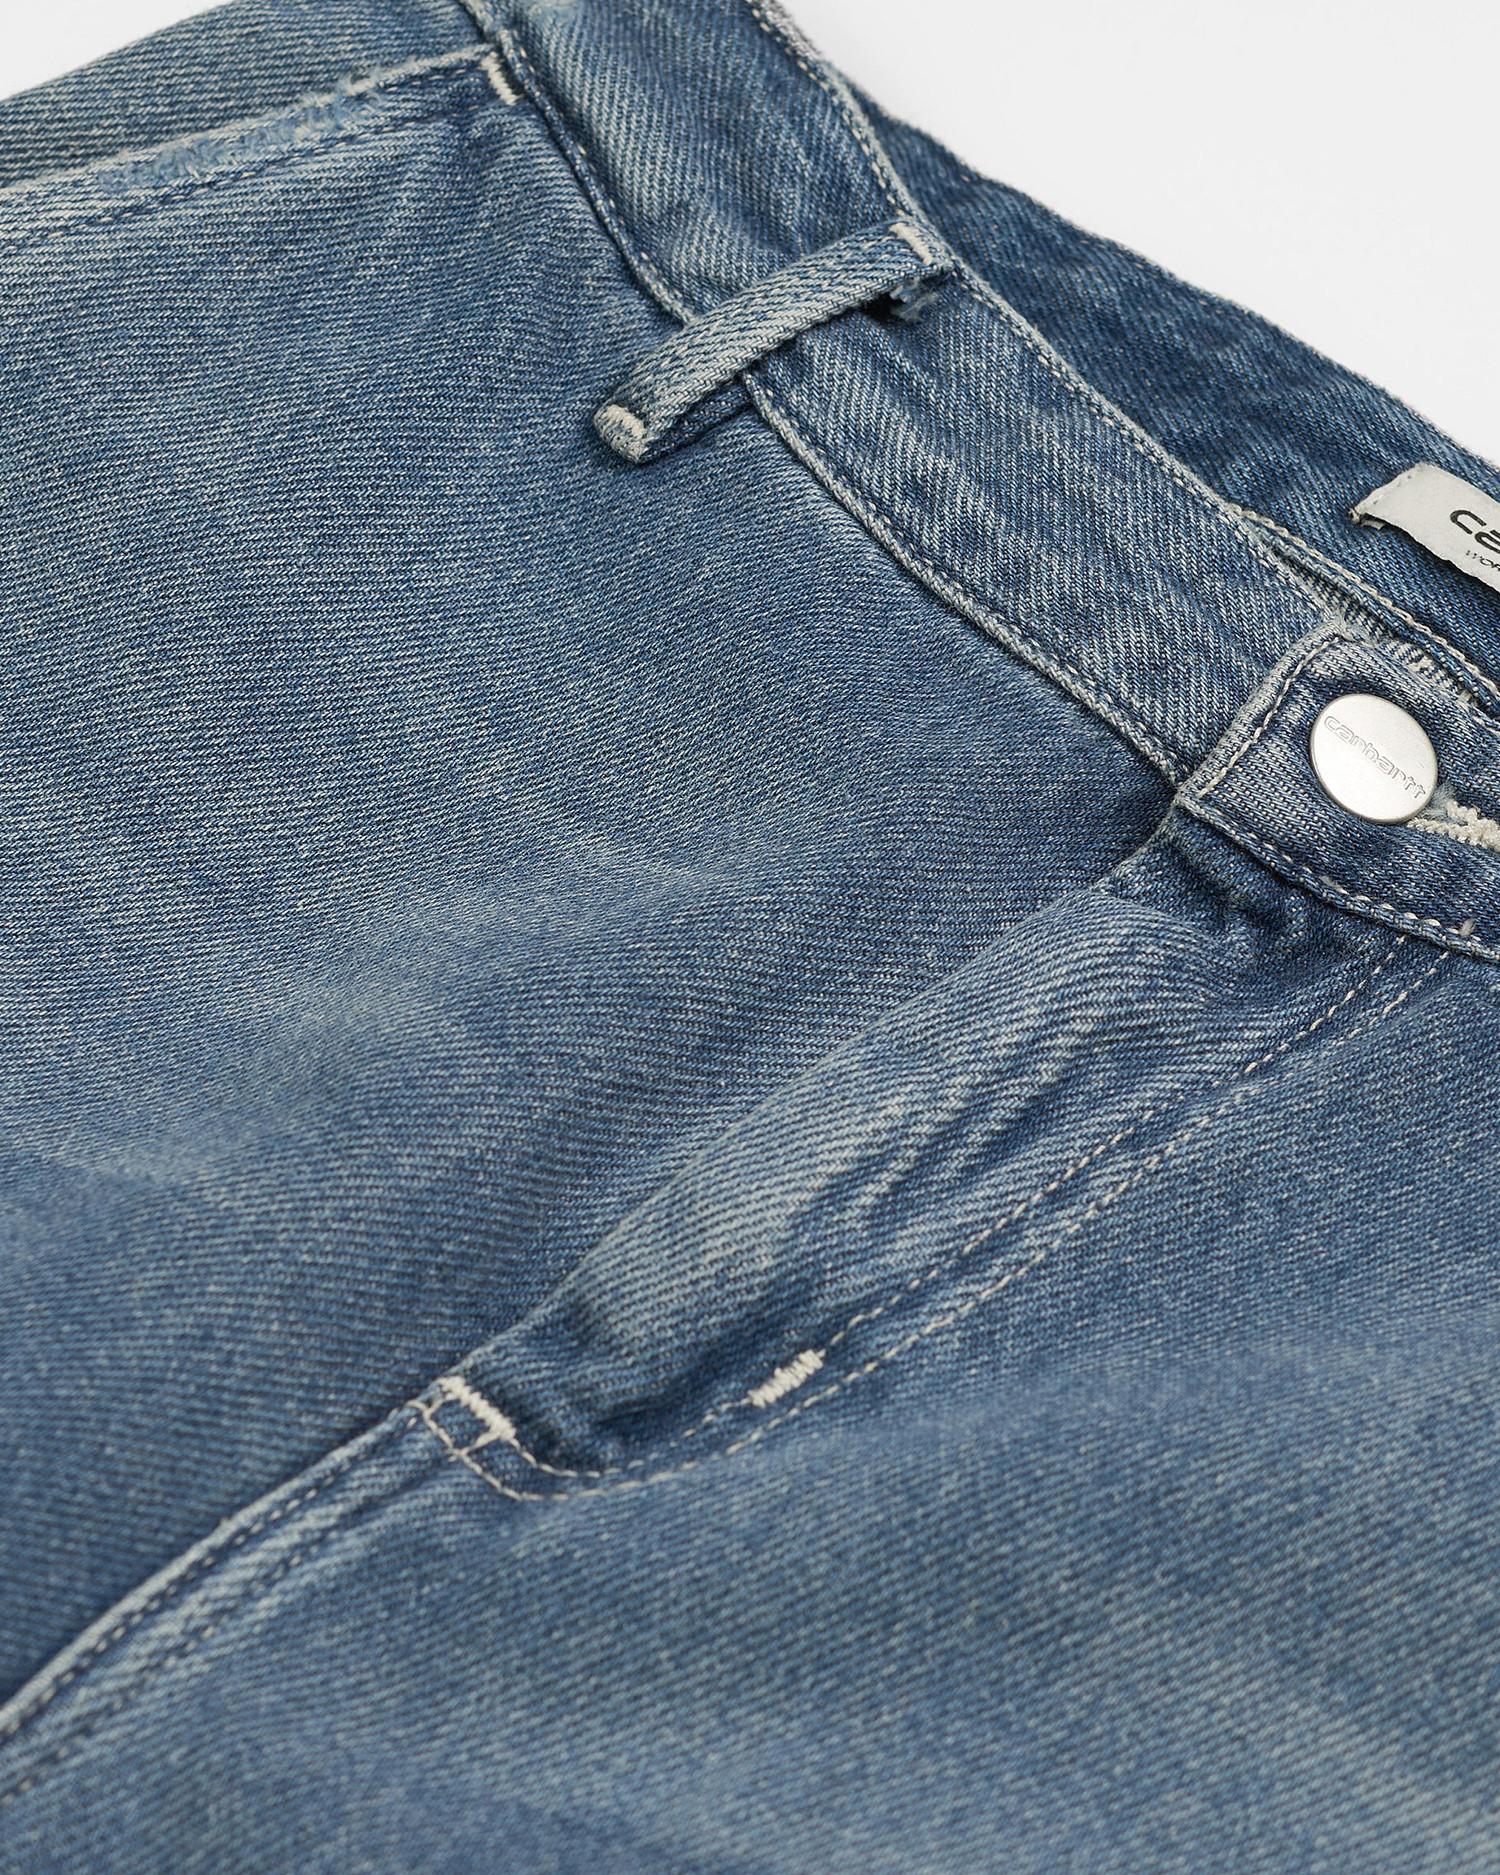 Carhartt W'Pierce Pant Blue Light Stone Washed